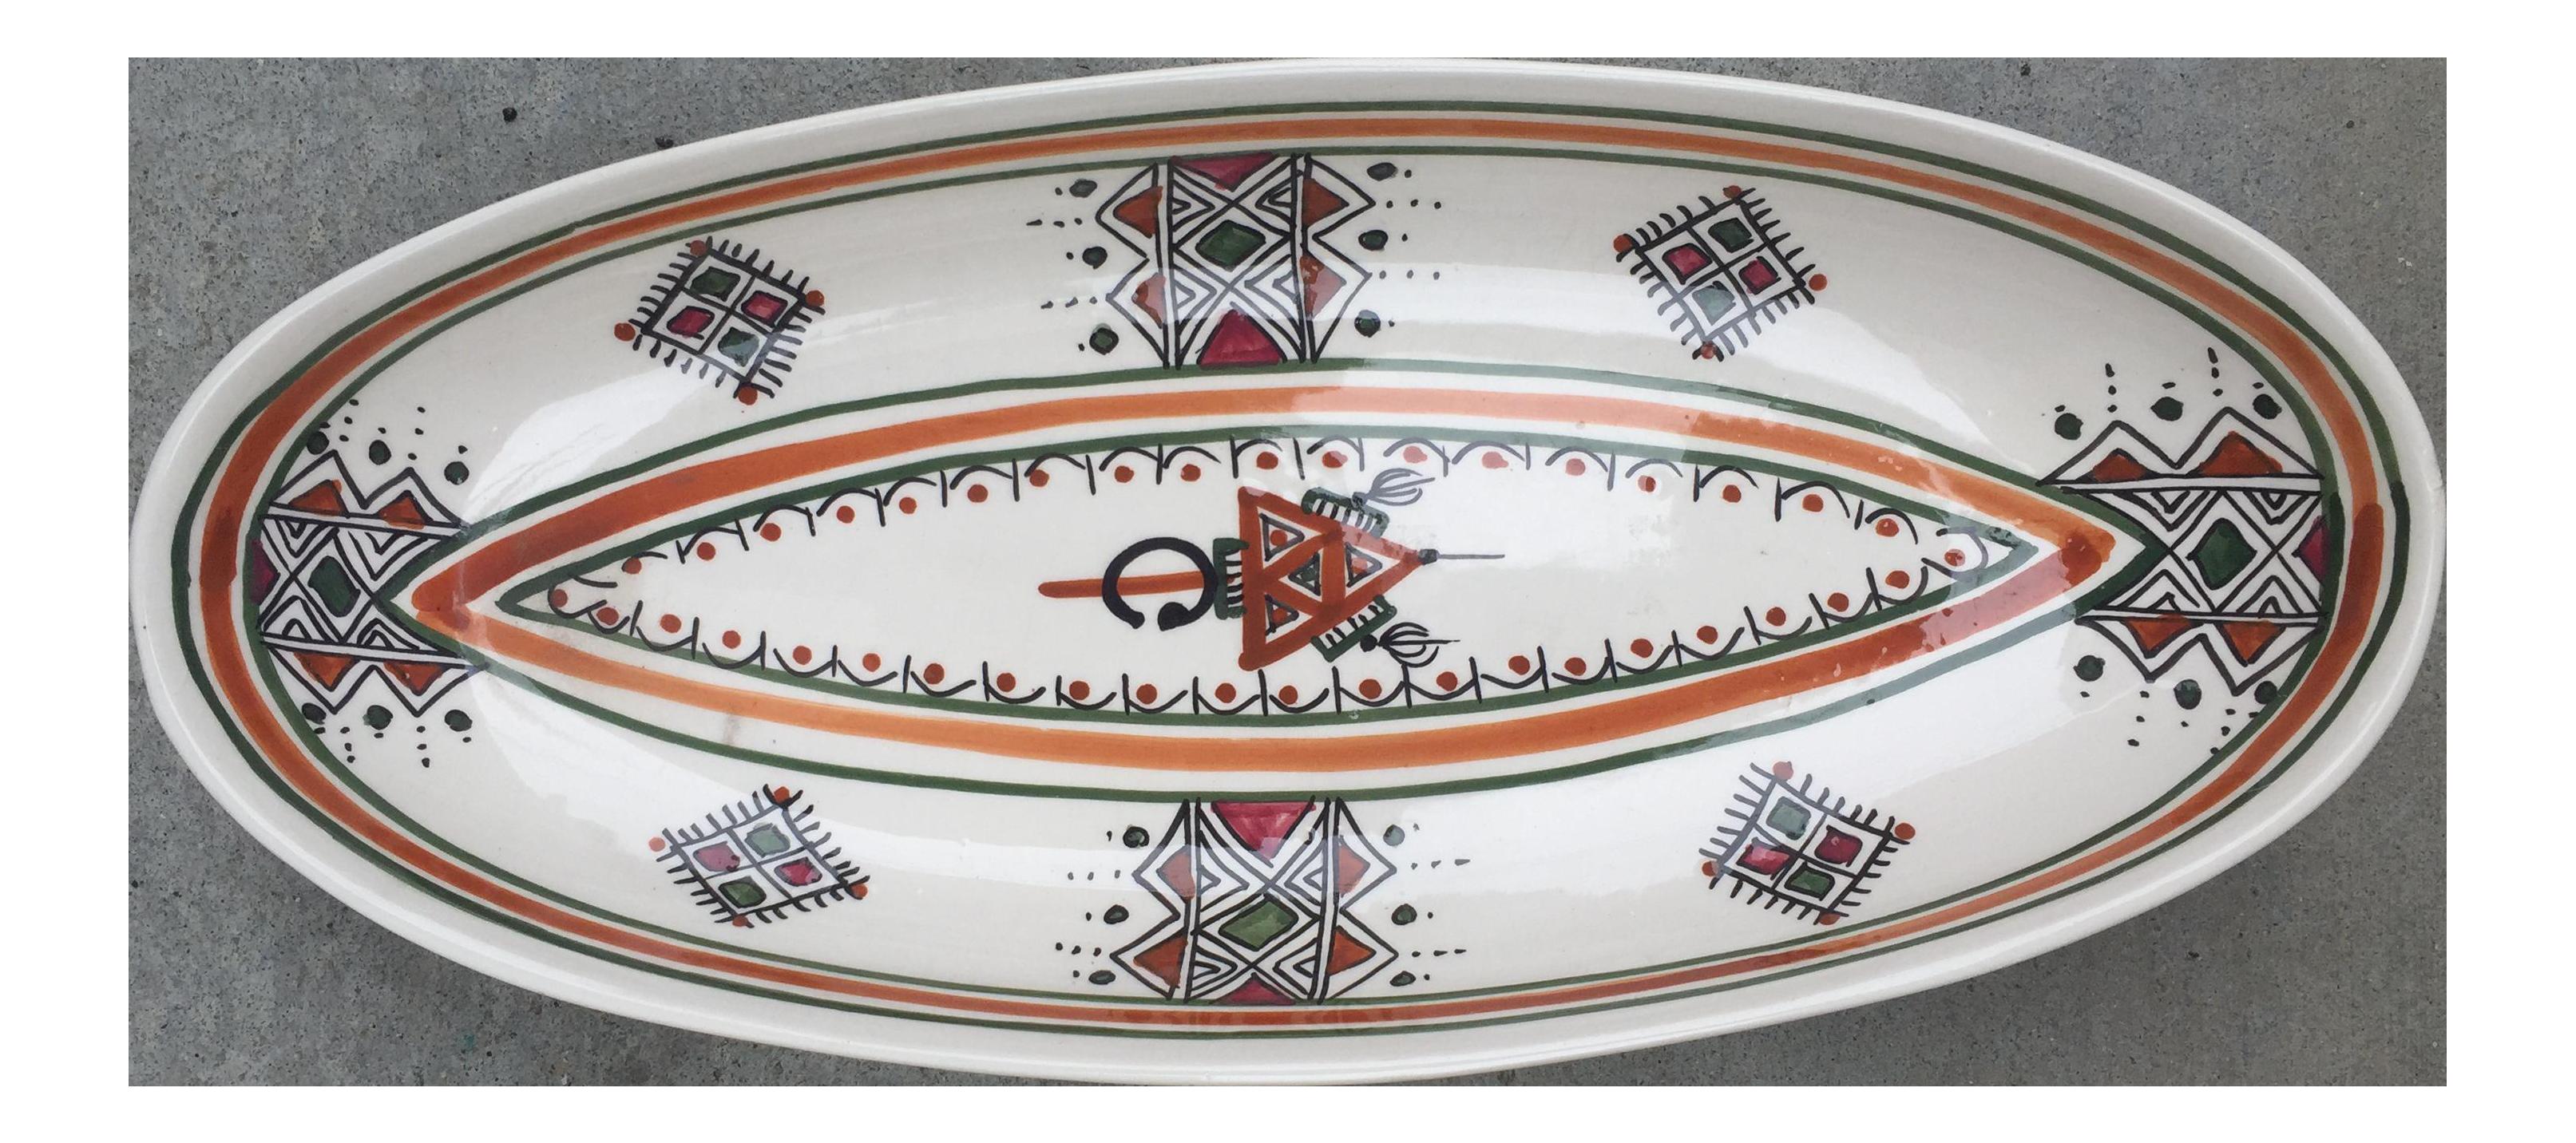 Oval Tunisian Ceramic Serving Dish - Image 1 of 6  sc 1 st  Chairish & Oval Tunisian Ceramic Serving Dish | Chairish